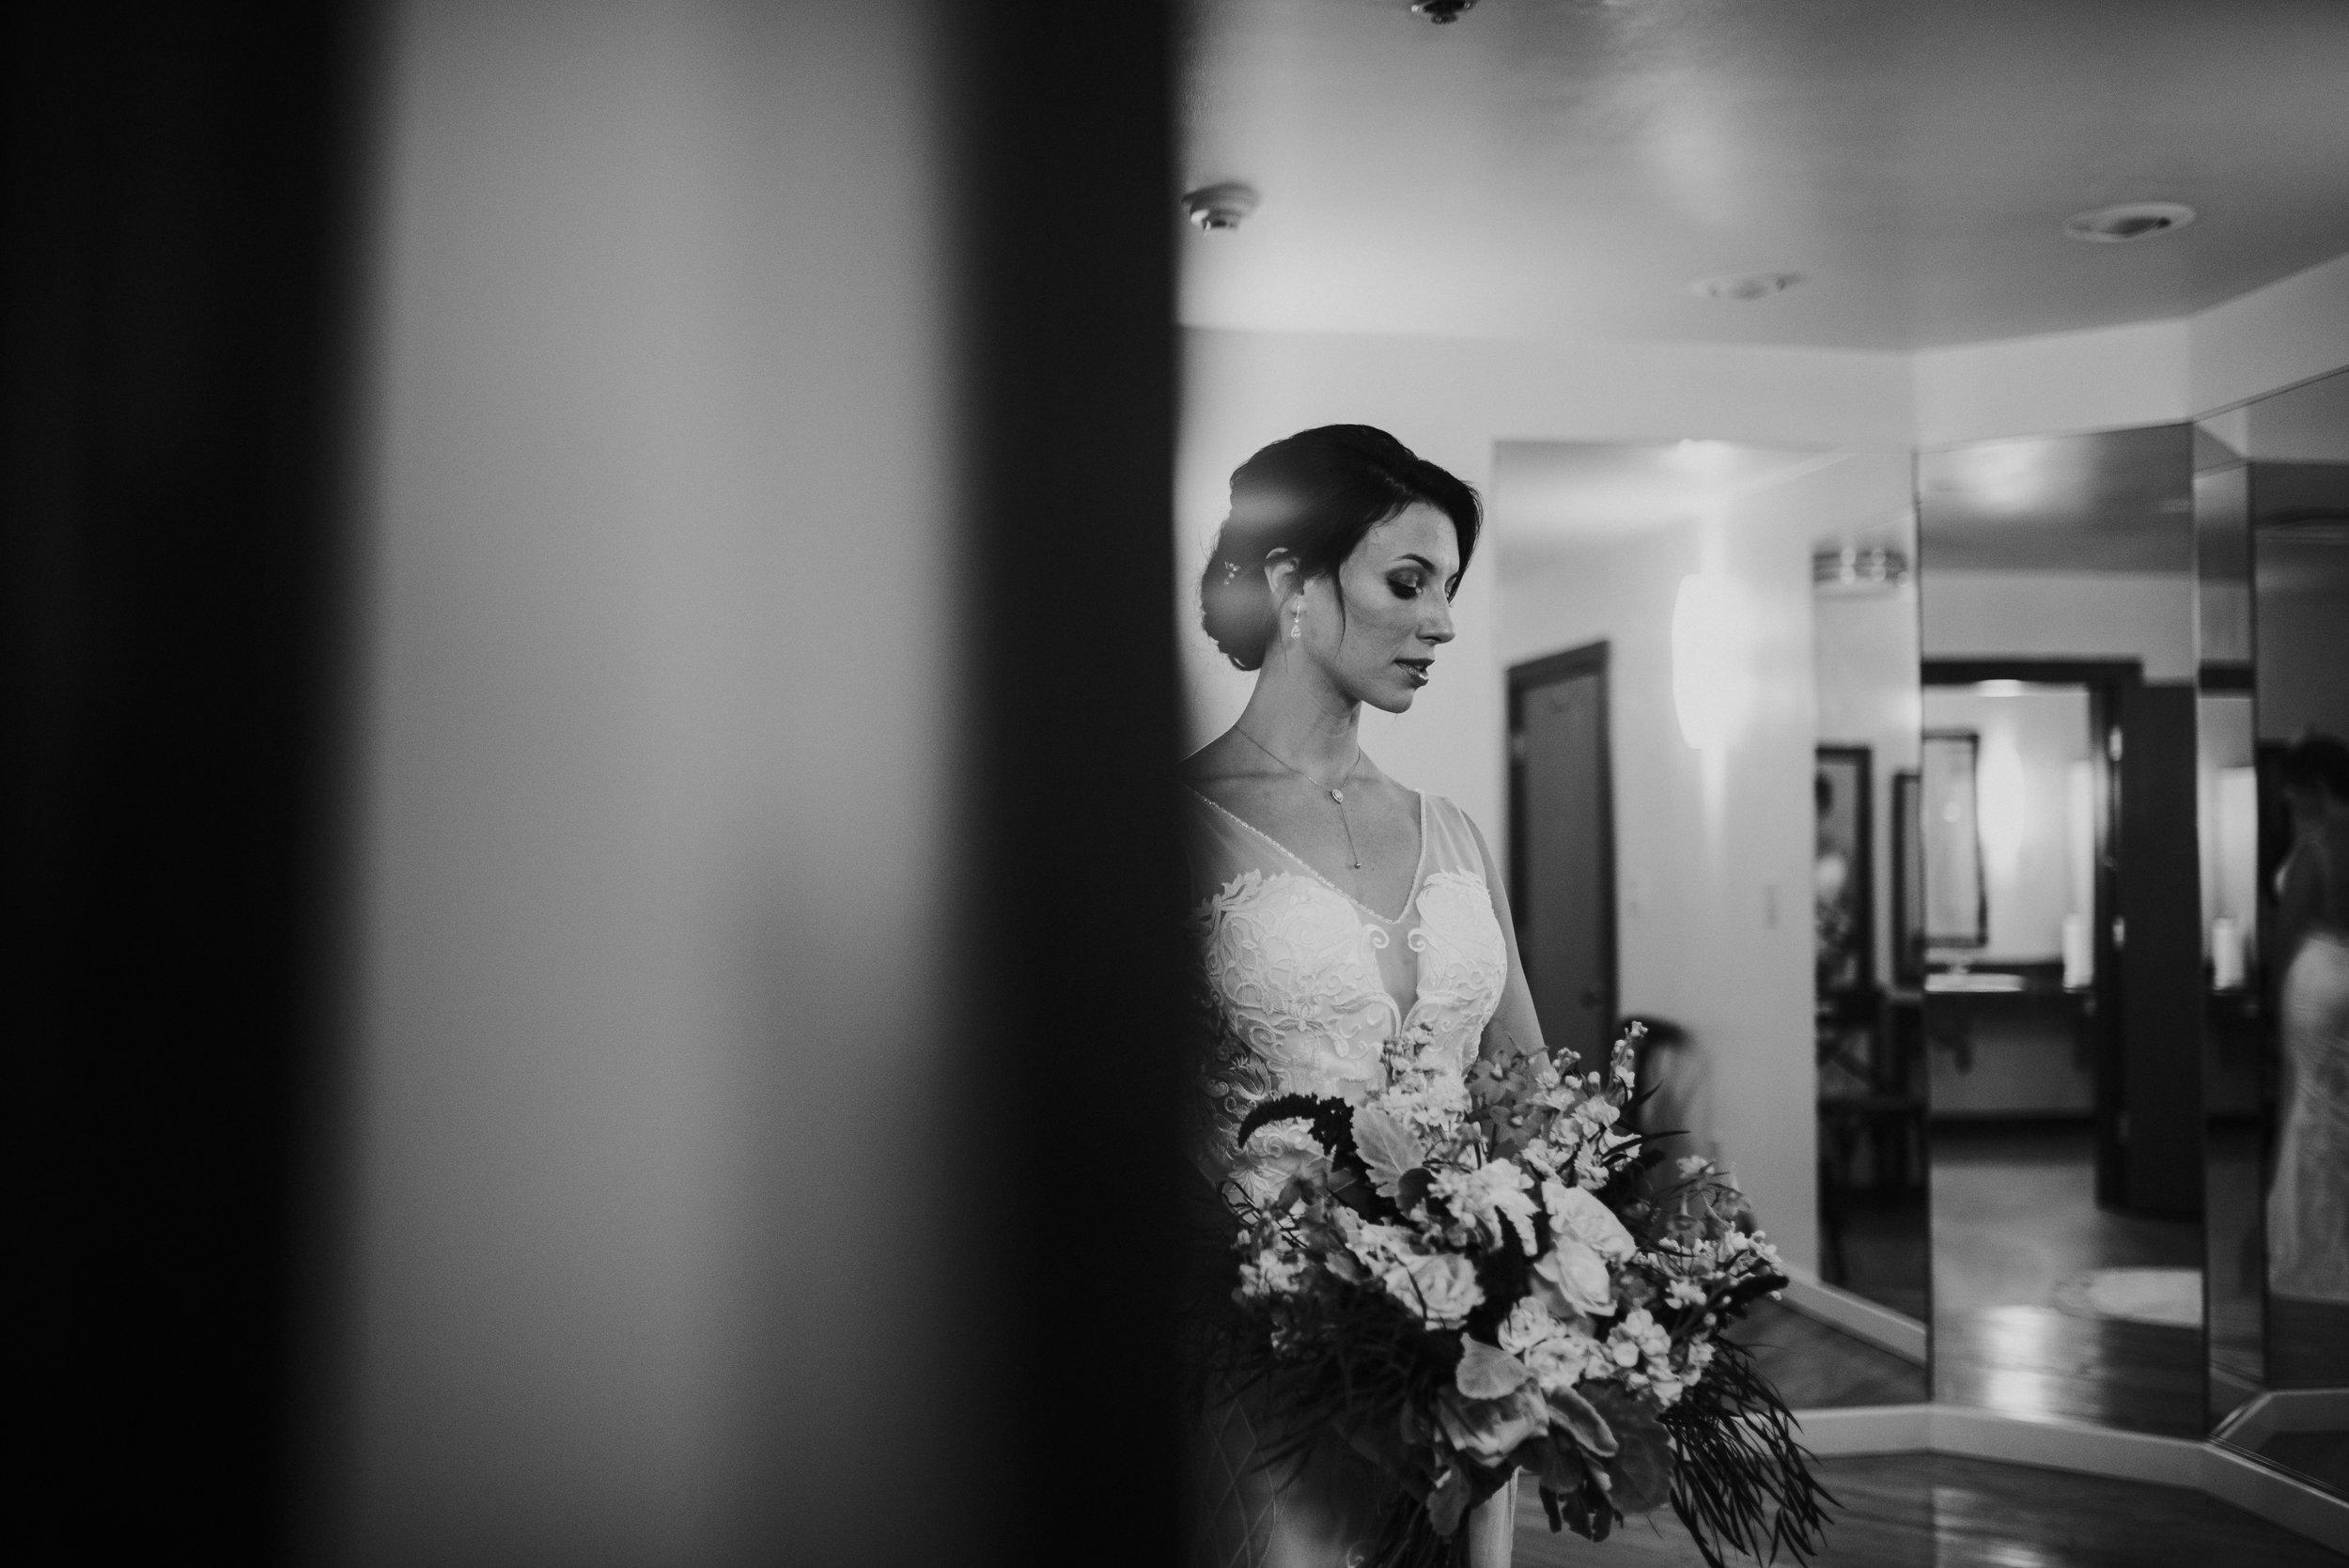 Bride in wedding dress at The Trolley Barn in Atlanta, GA